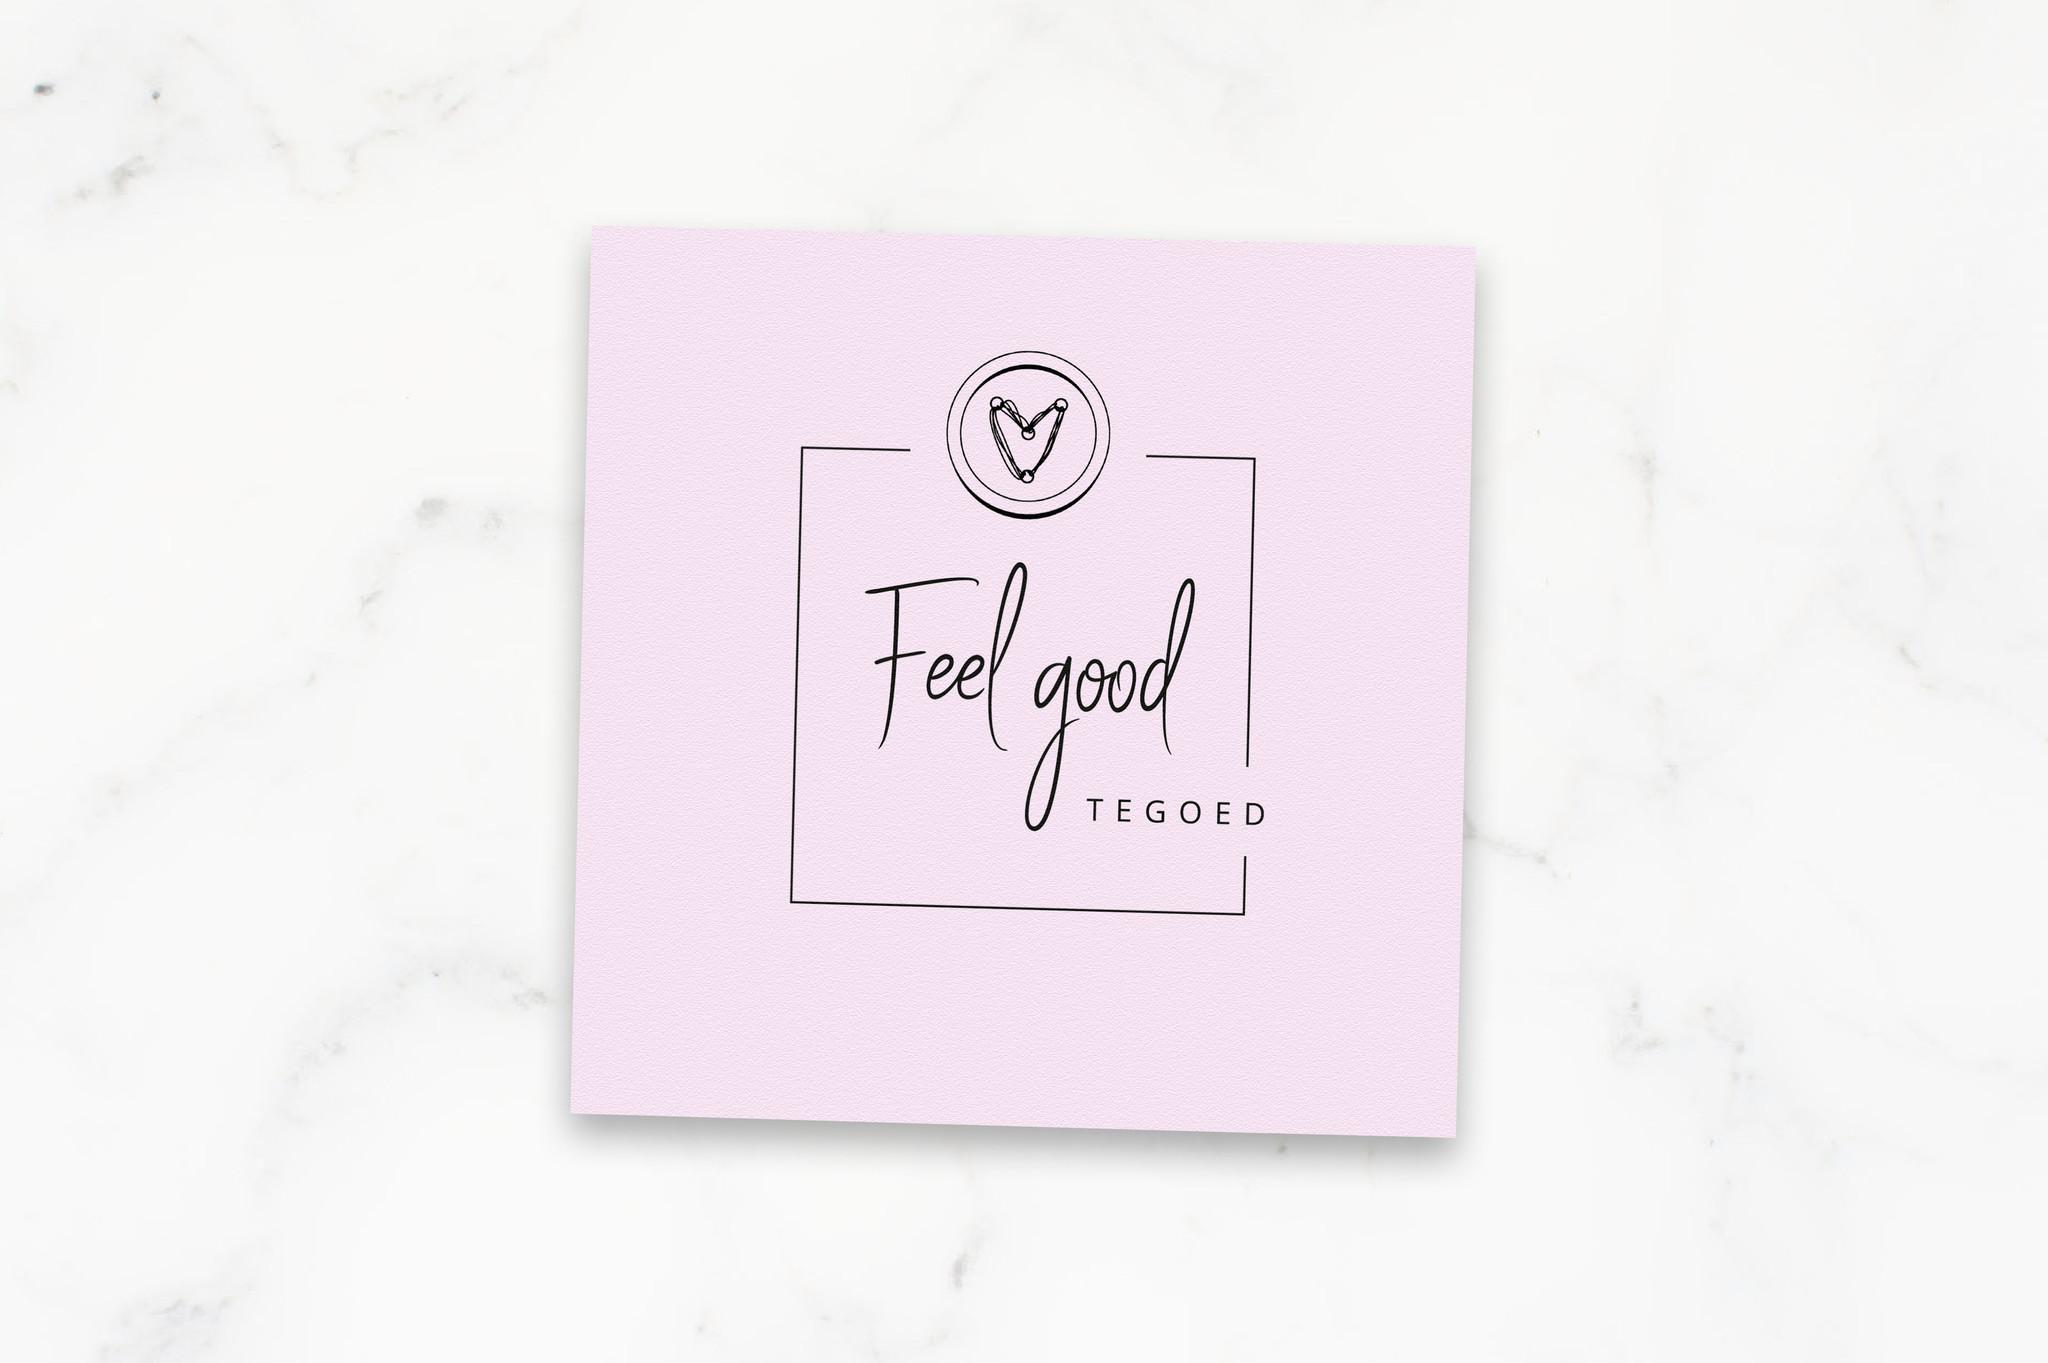 Feel Good Tegoed 'in je mailbox' 10 euro